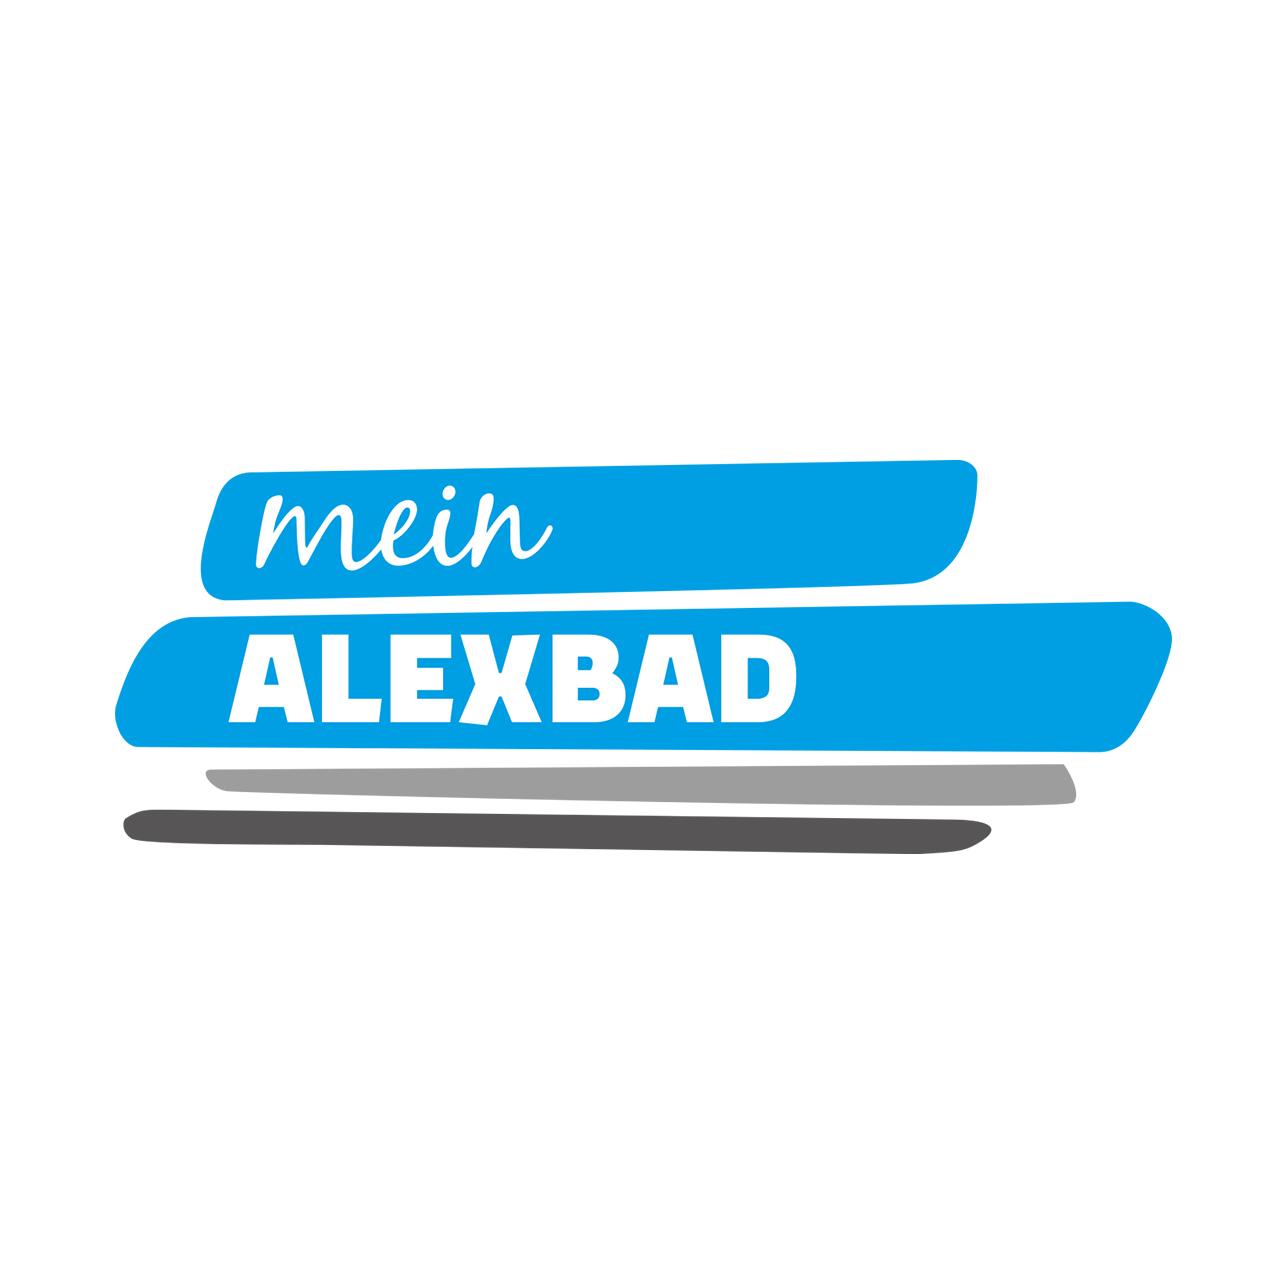 ALEXBAD Gesundheitszentrum Bad Alexandersbad